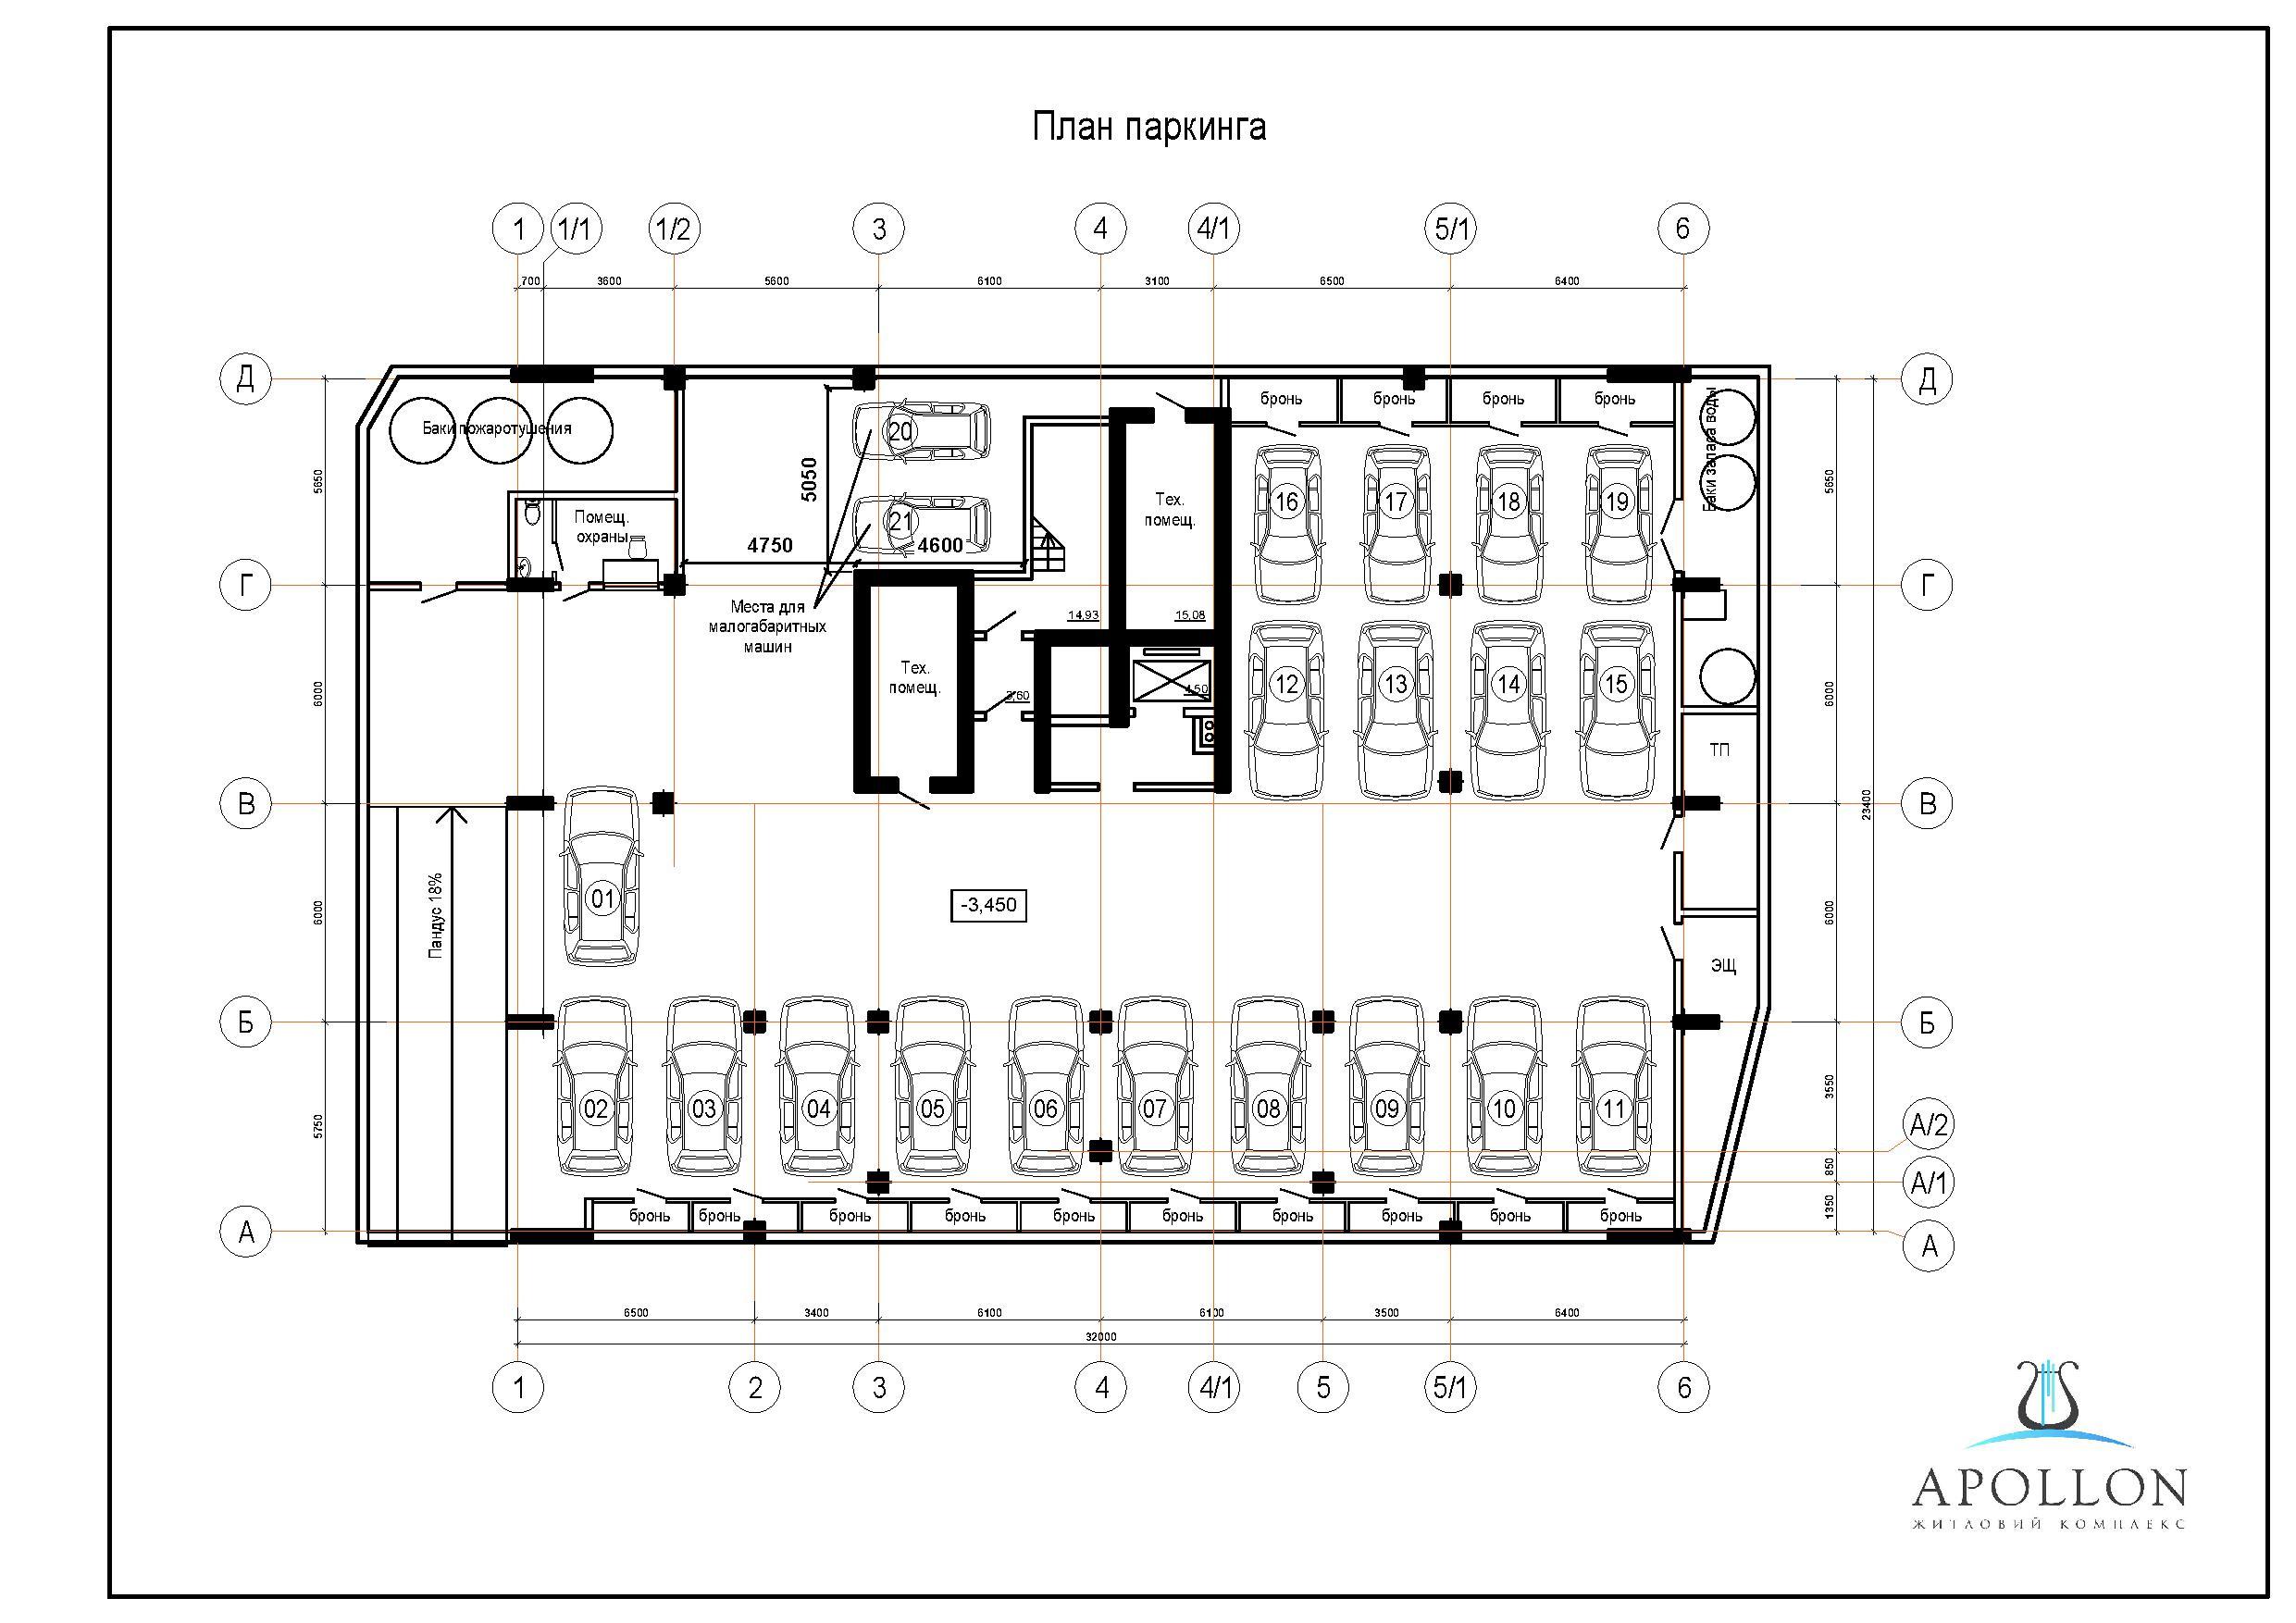 ЖК Аполлон Гефест план паркинга